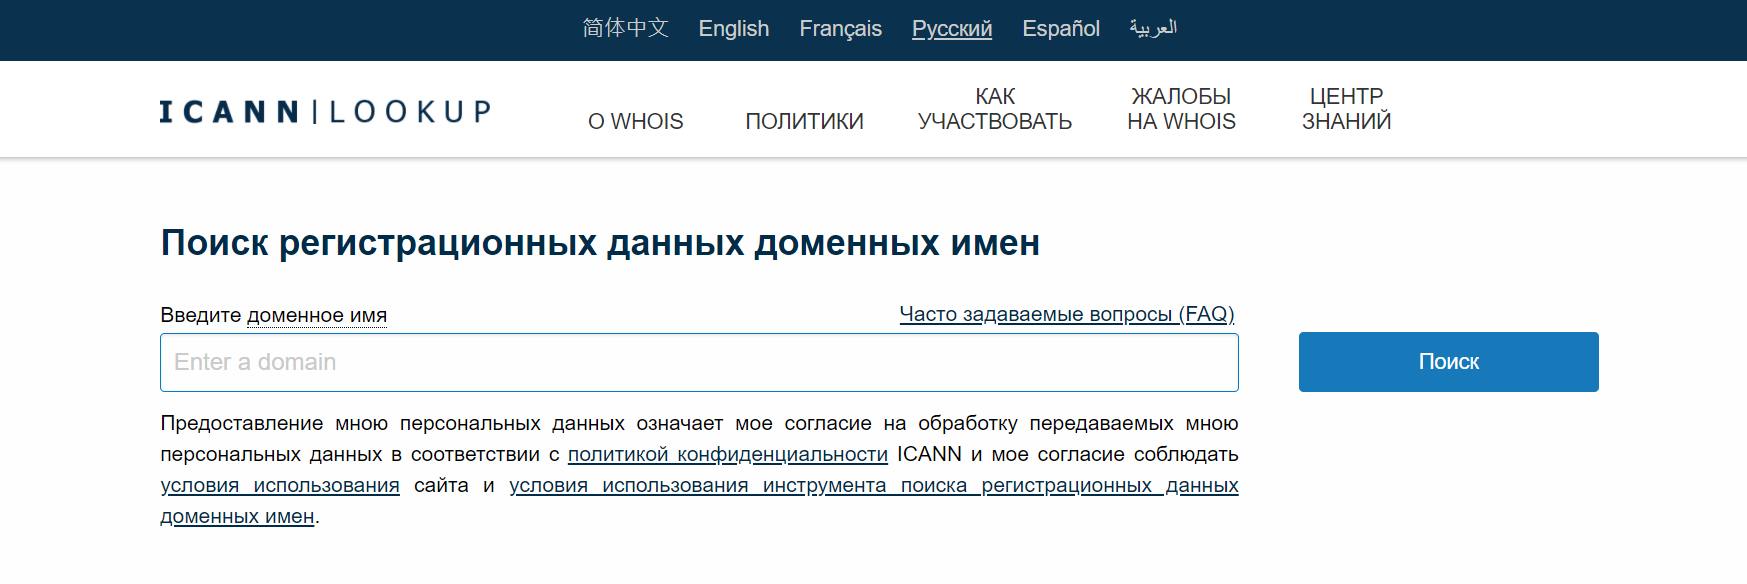 Интерфейс ICANN LOOKUP